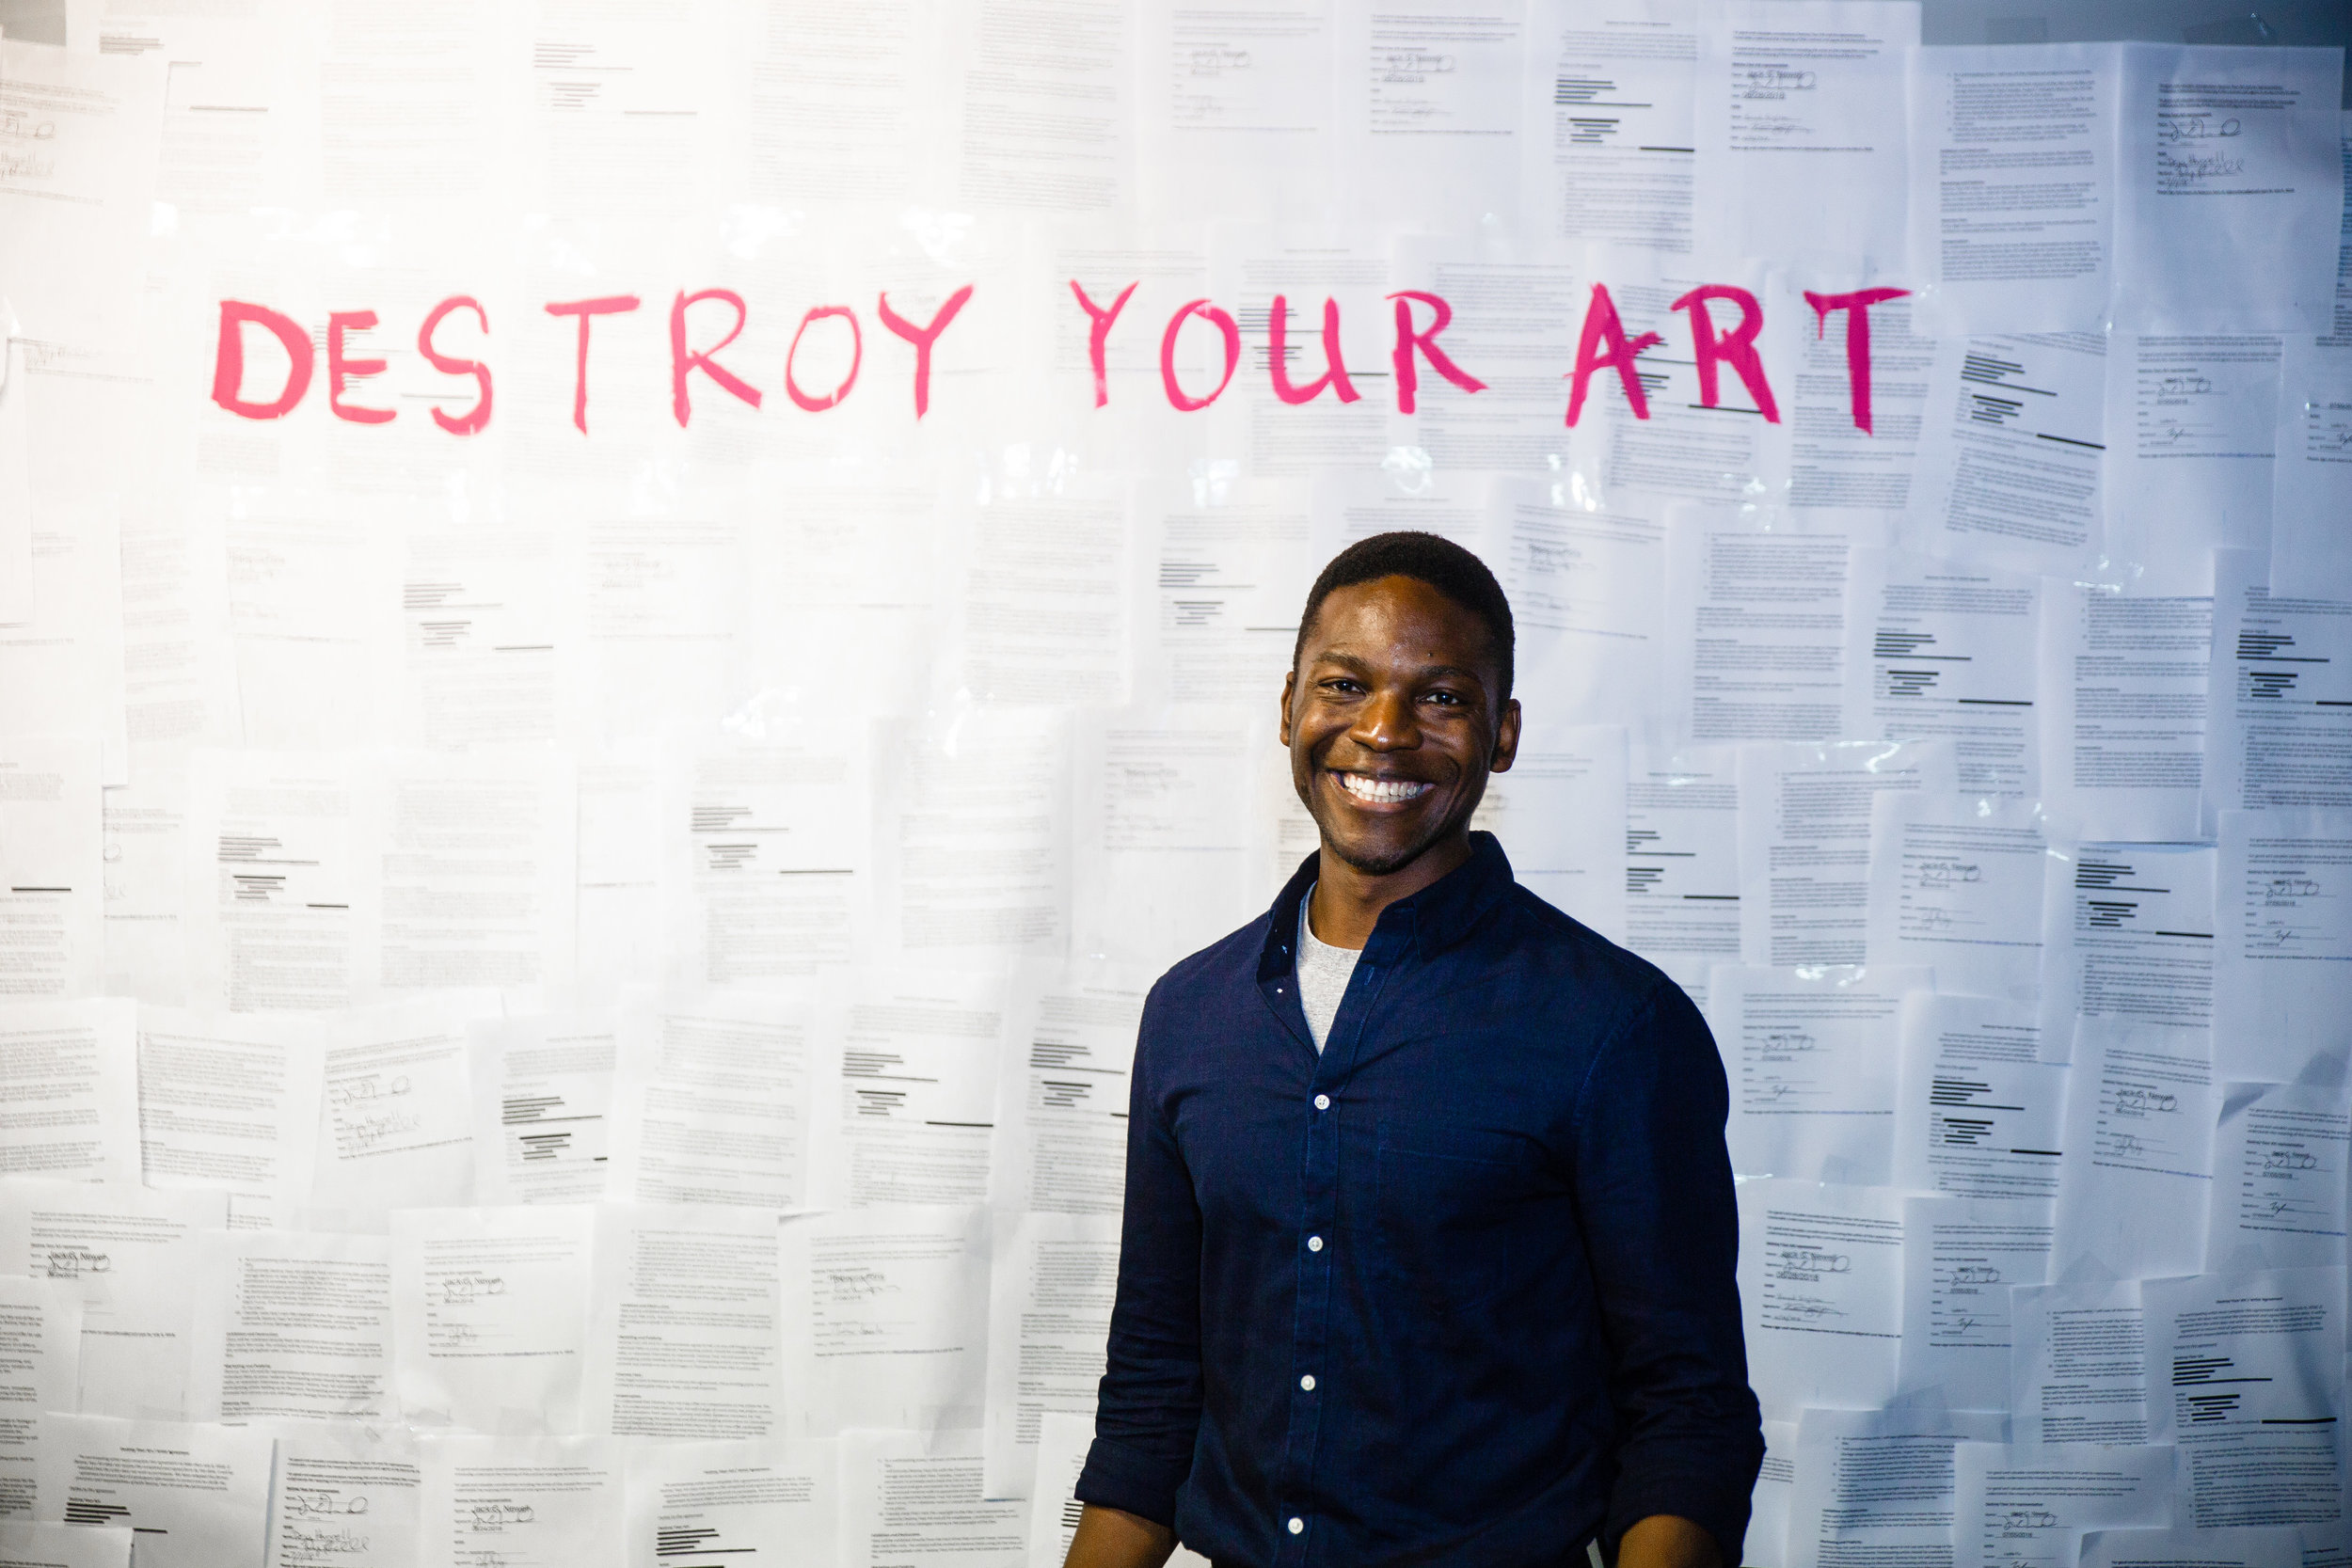 Destroy Your Art 08-10-18 timothymschmidt-1674.jpg